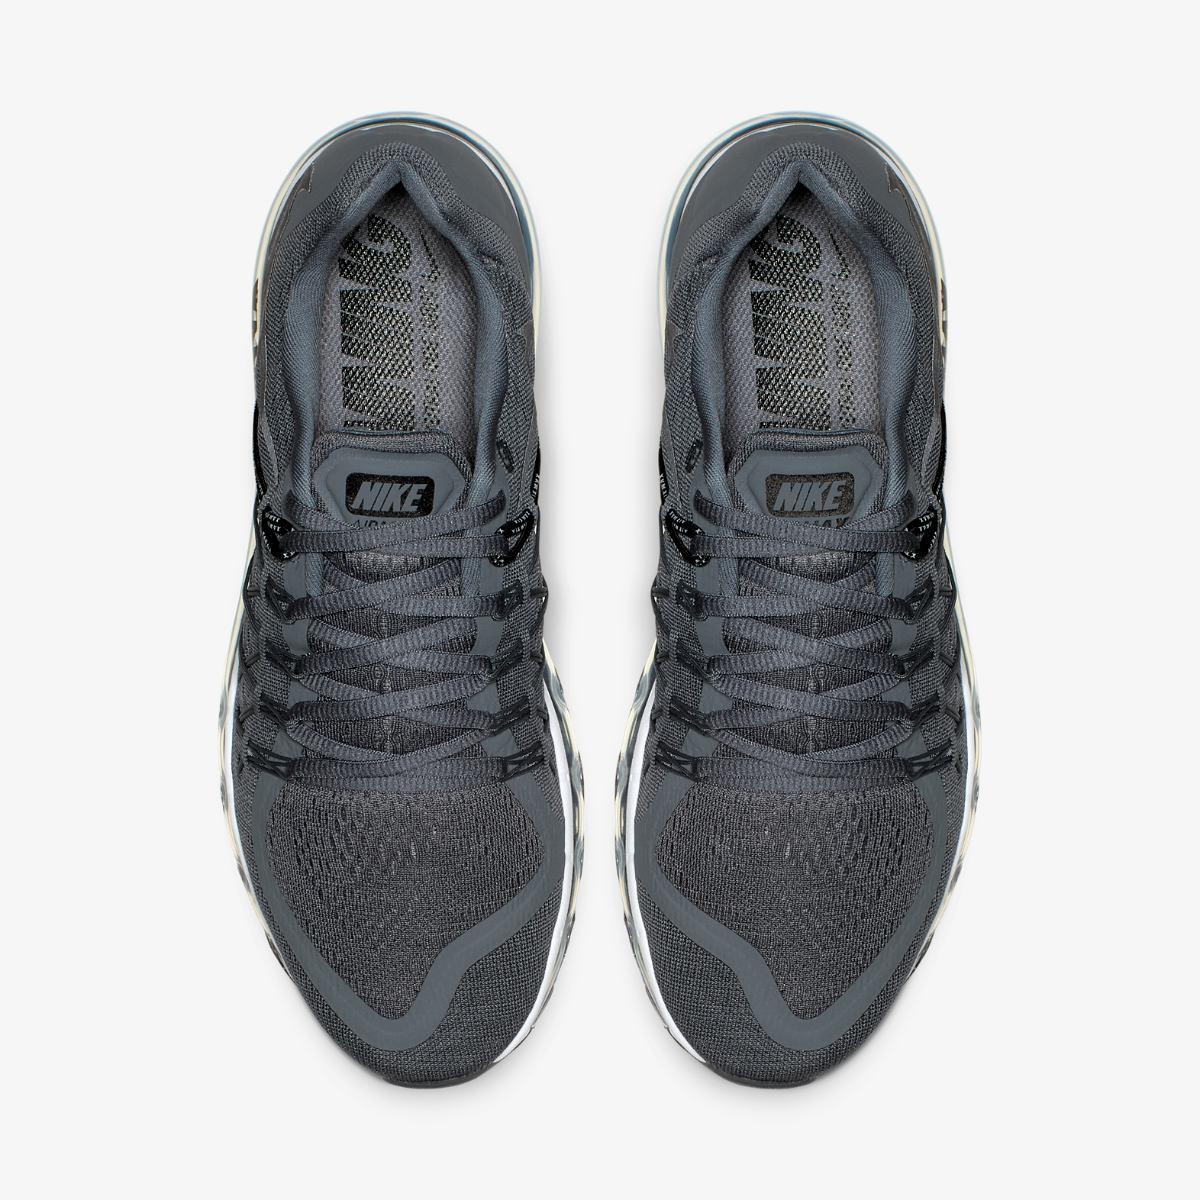 9bae17c9 Кроссовки Nike AIR MAX 2015 CD1508-002 купить   deltasport.ua